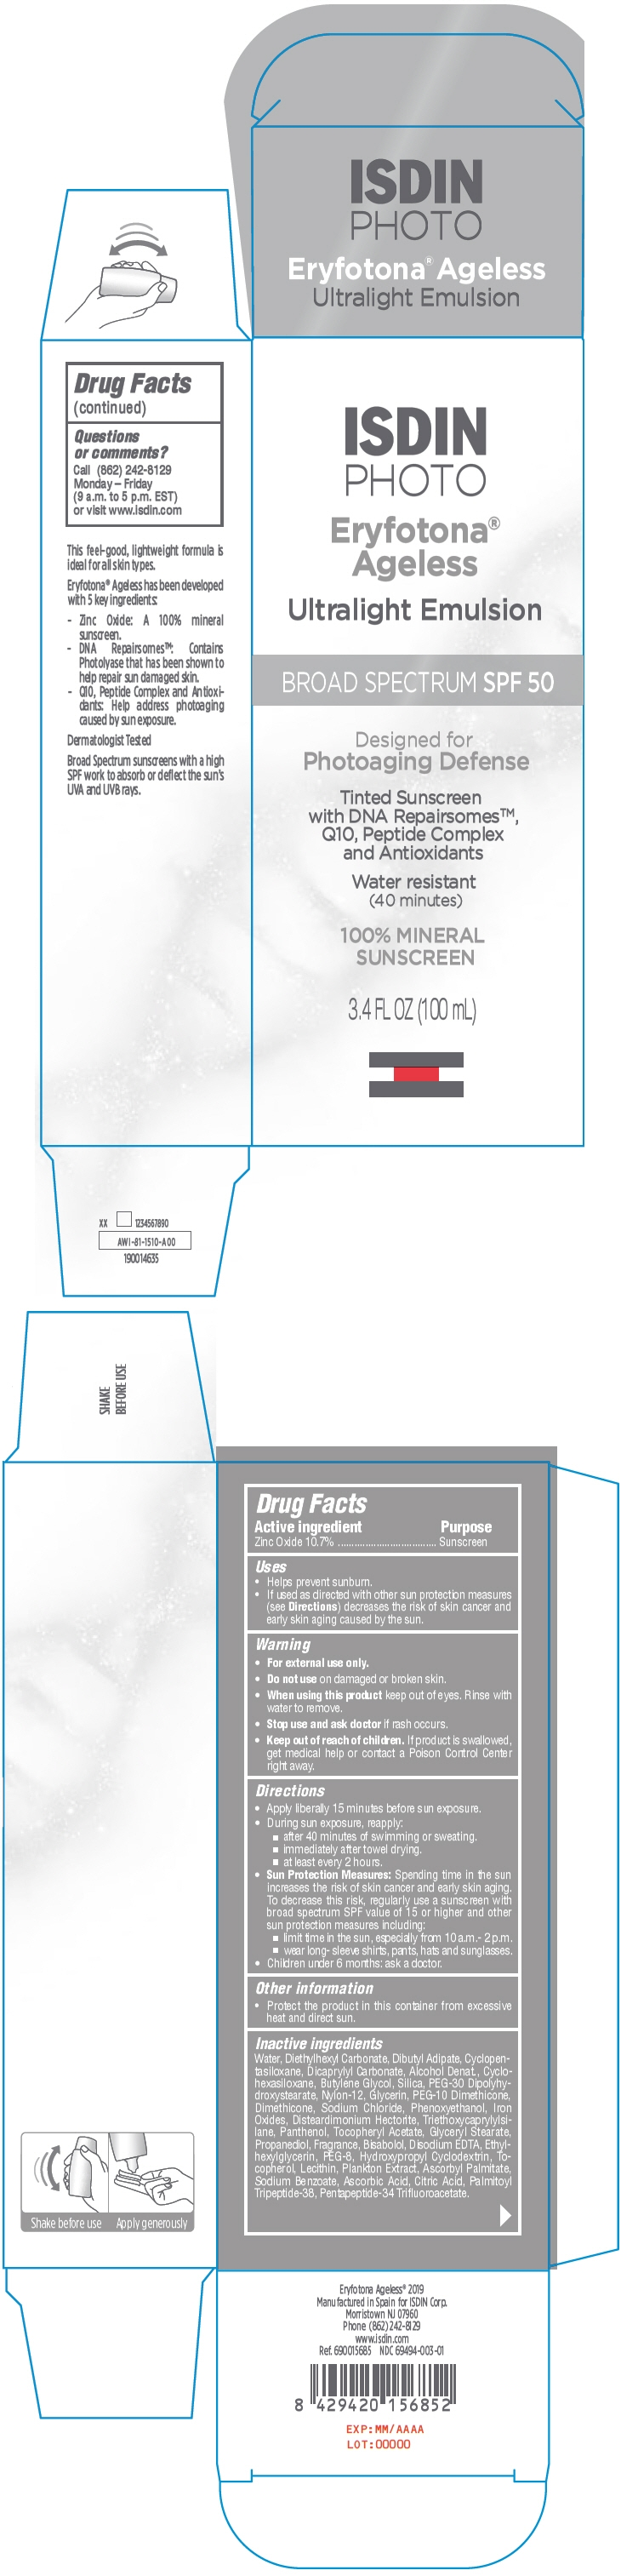 PRINCIPAL DISPLAY PANEL - 100 mL Bottle Carton